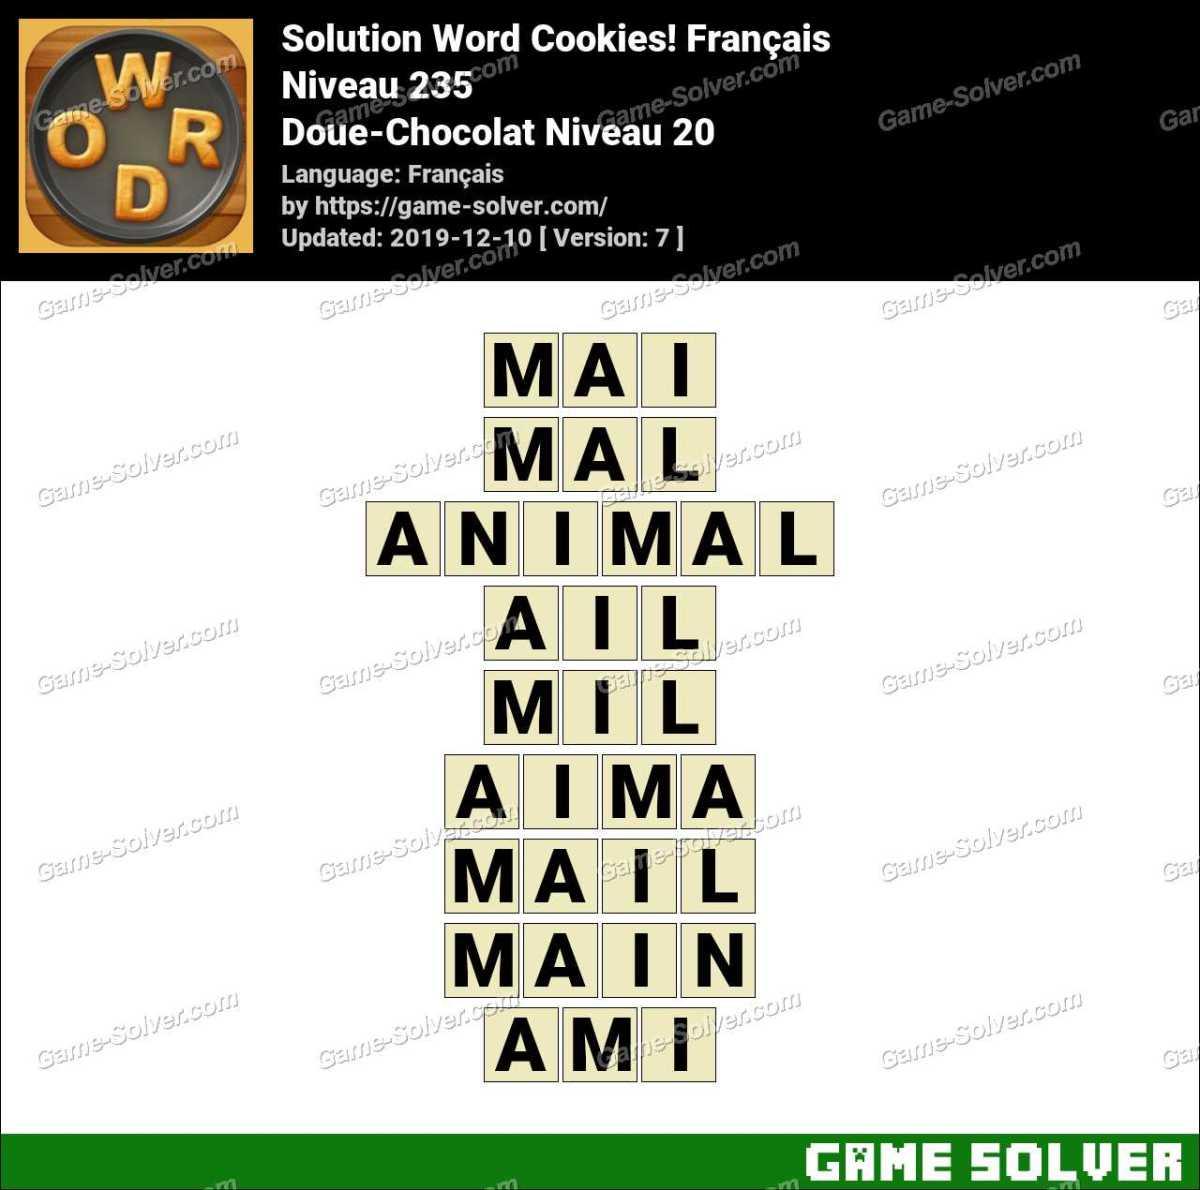 Solution Word Cookies Doue-Chocolat Niveau 20